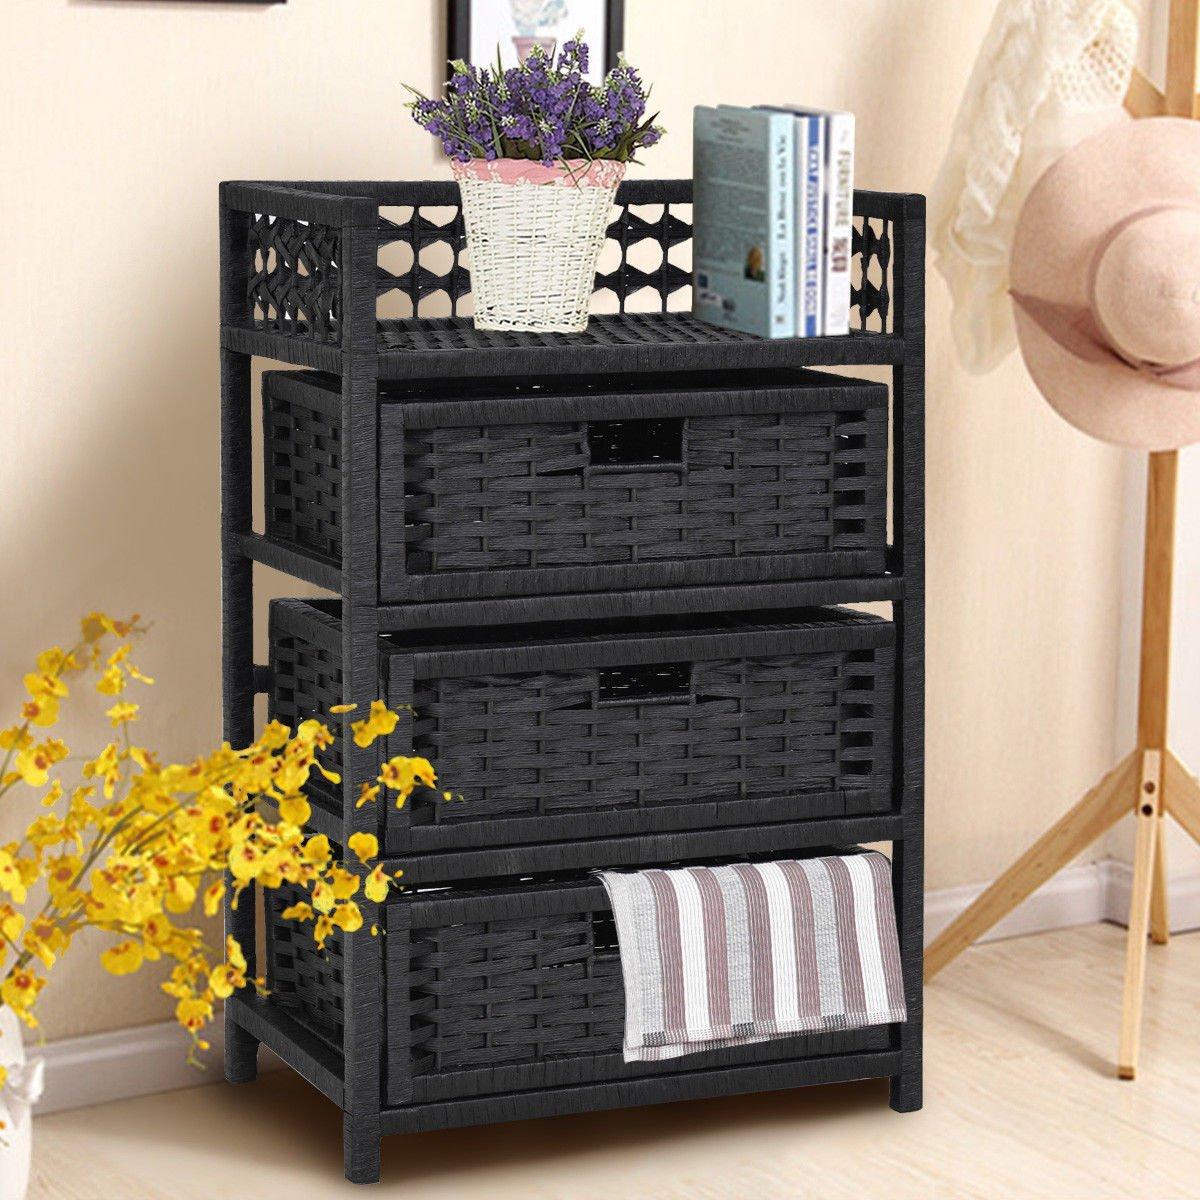 3 Drawer Storage Unit Tower Shelf Wicker Baskets Storage Chest Rack Black